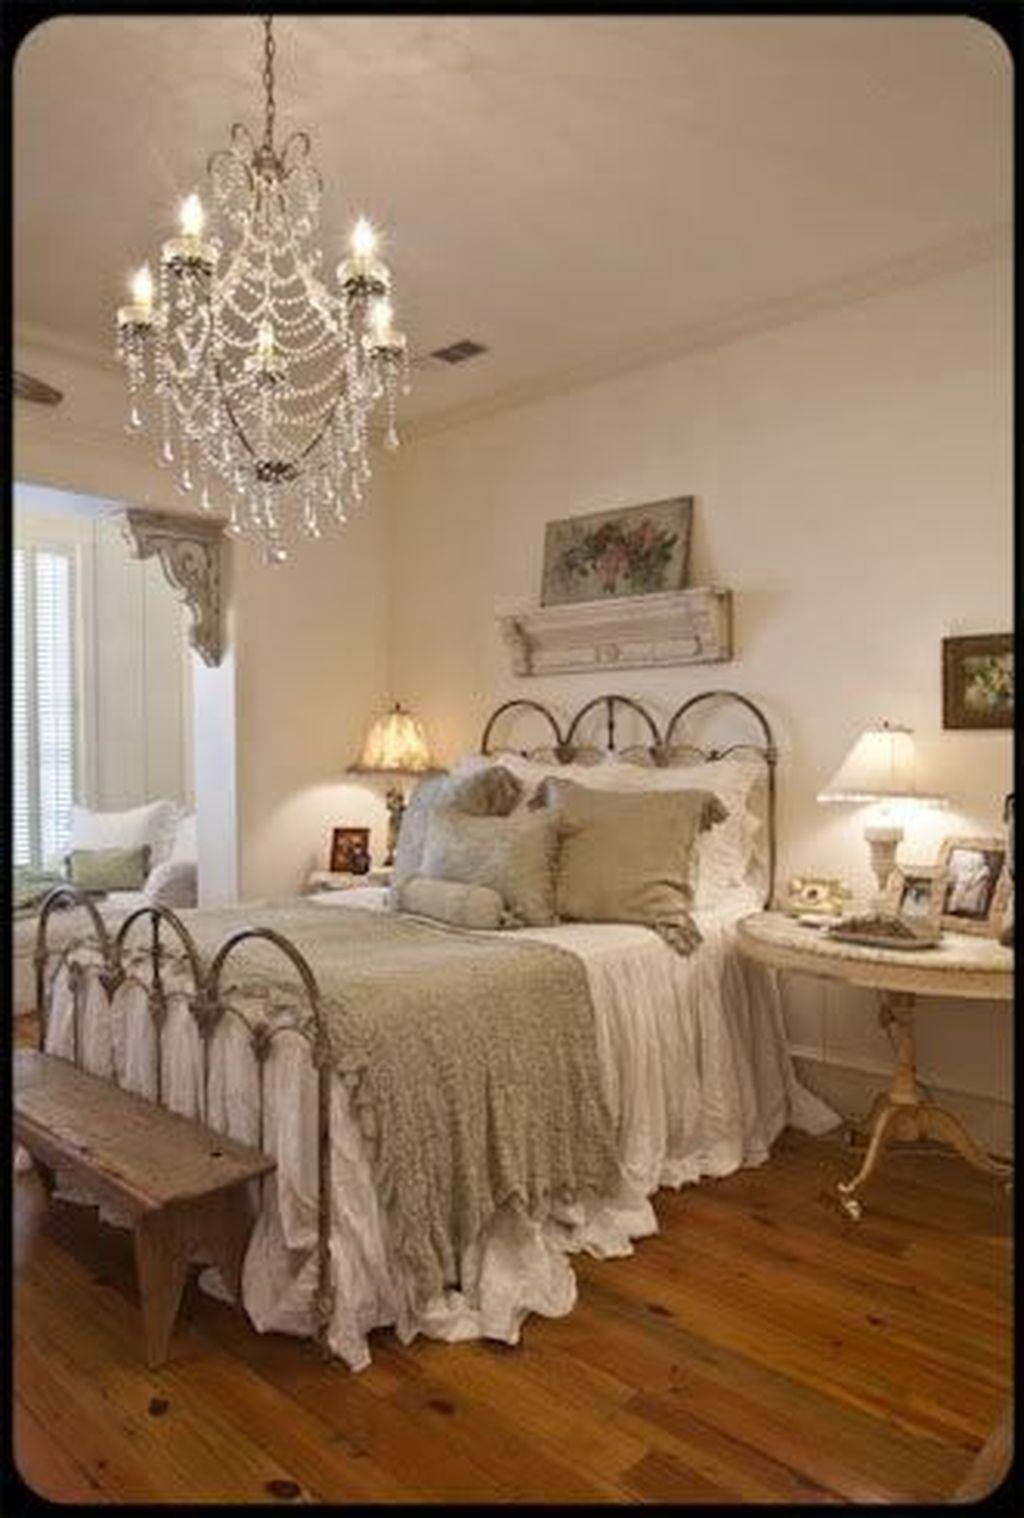 Classic and vintage farmhouse bedroom ideas 60